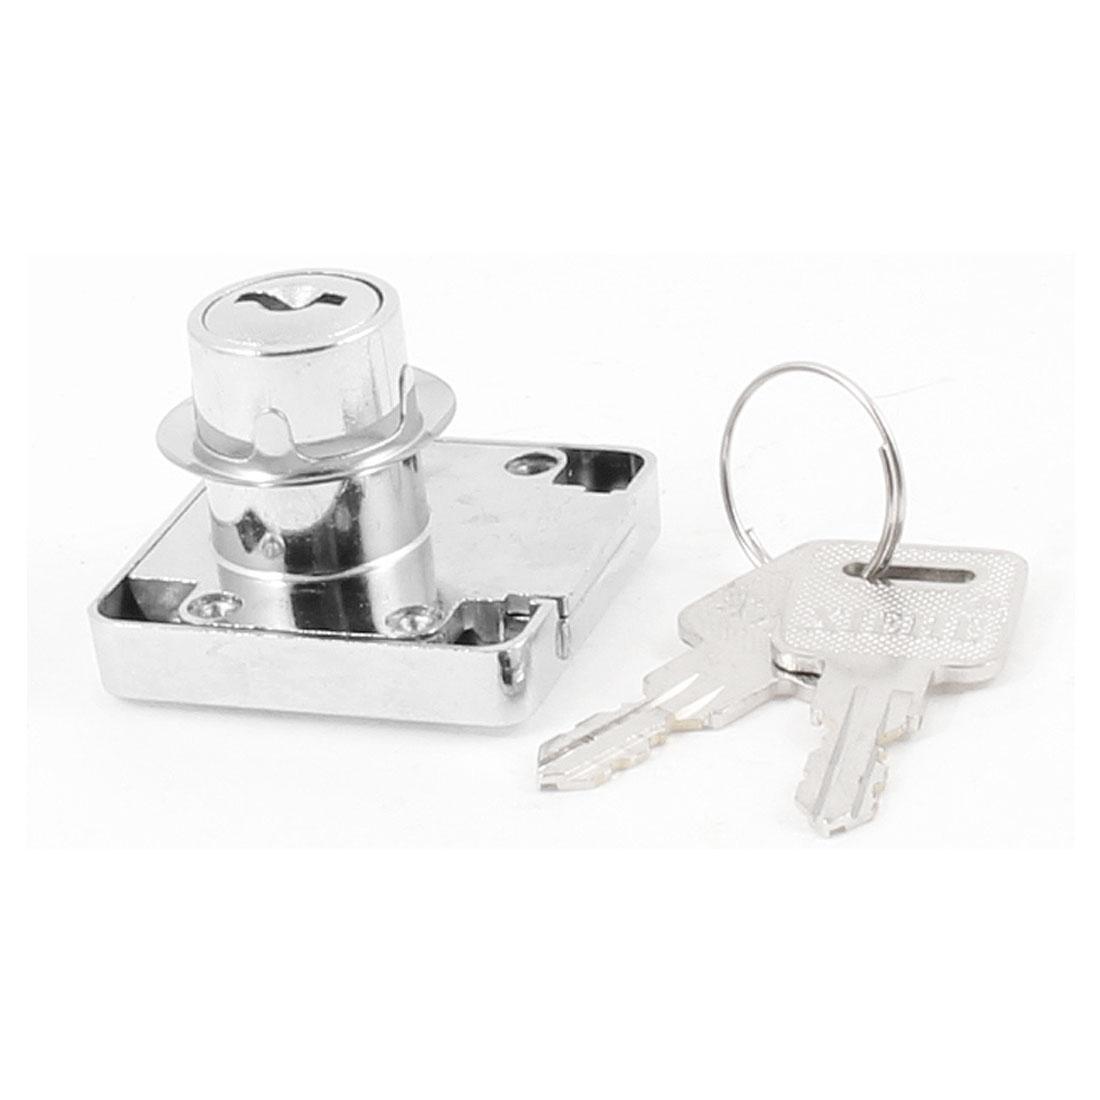 Home Office Silver Tone Metal 40mm x 39mm Cabinet Drawer Lock w 2 Keys